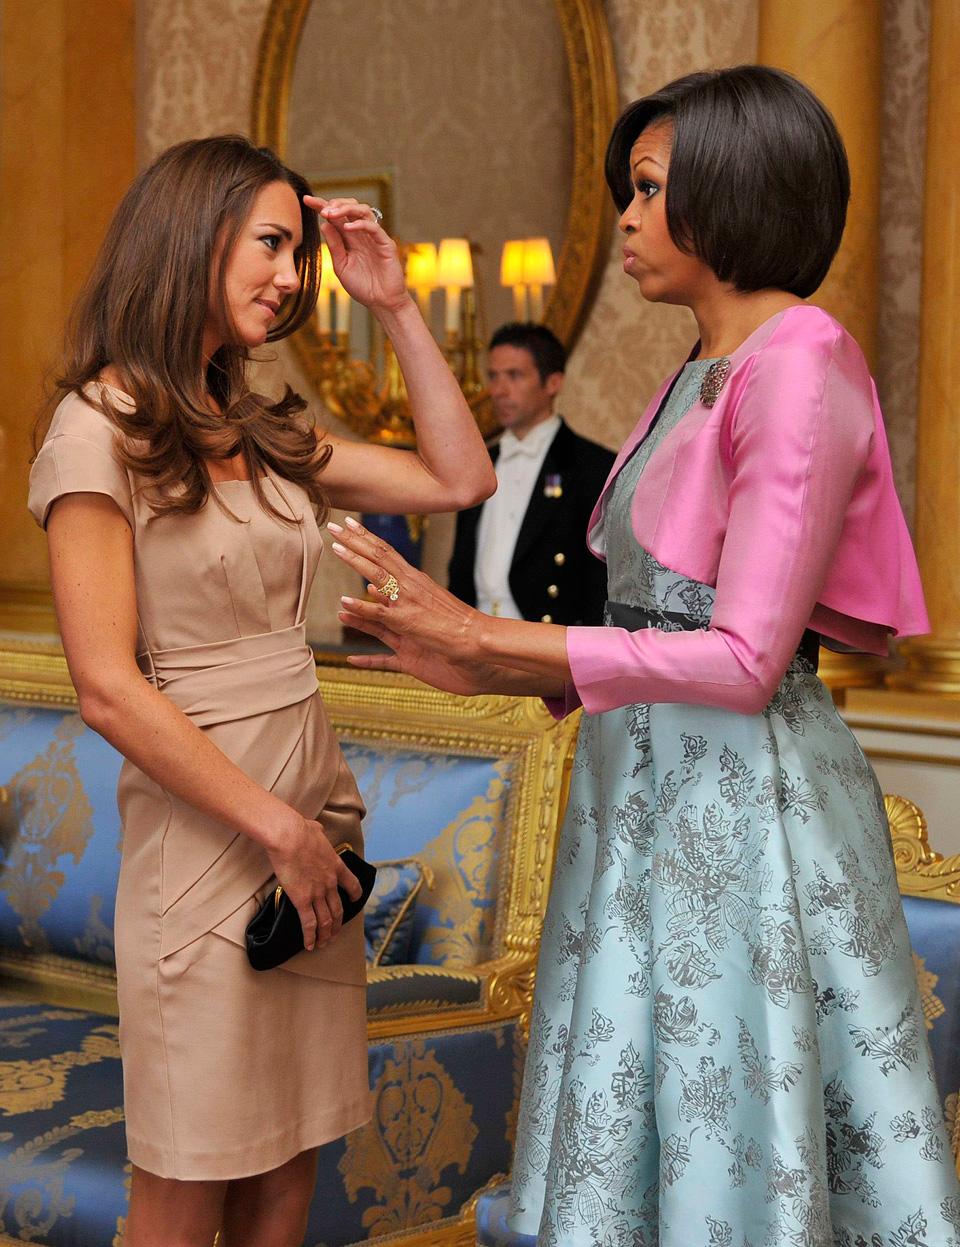 Michele Obama and Kate Middleton